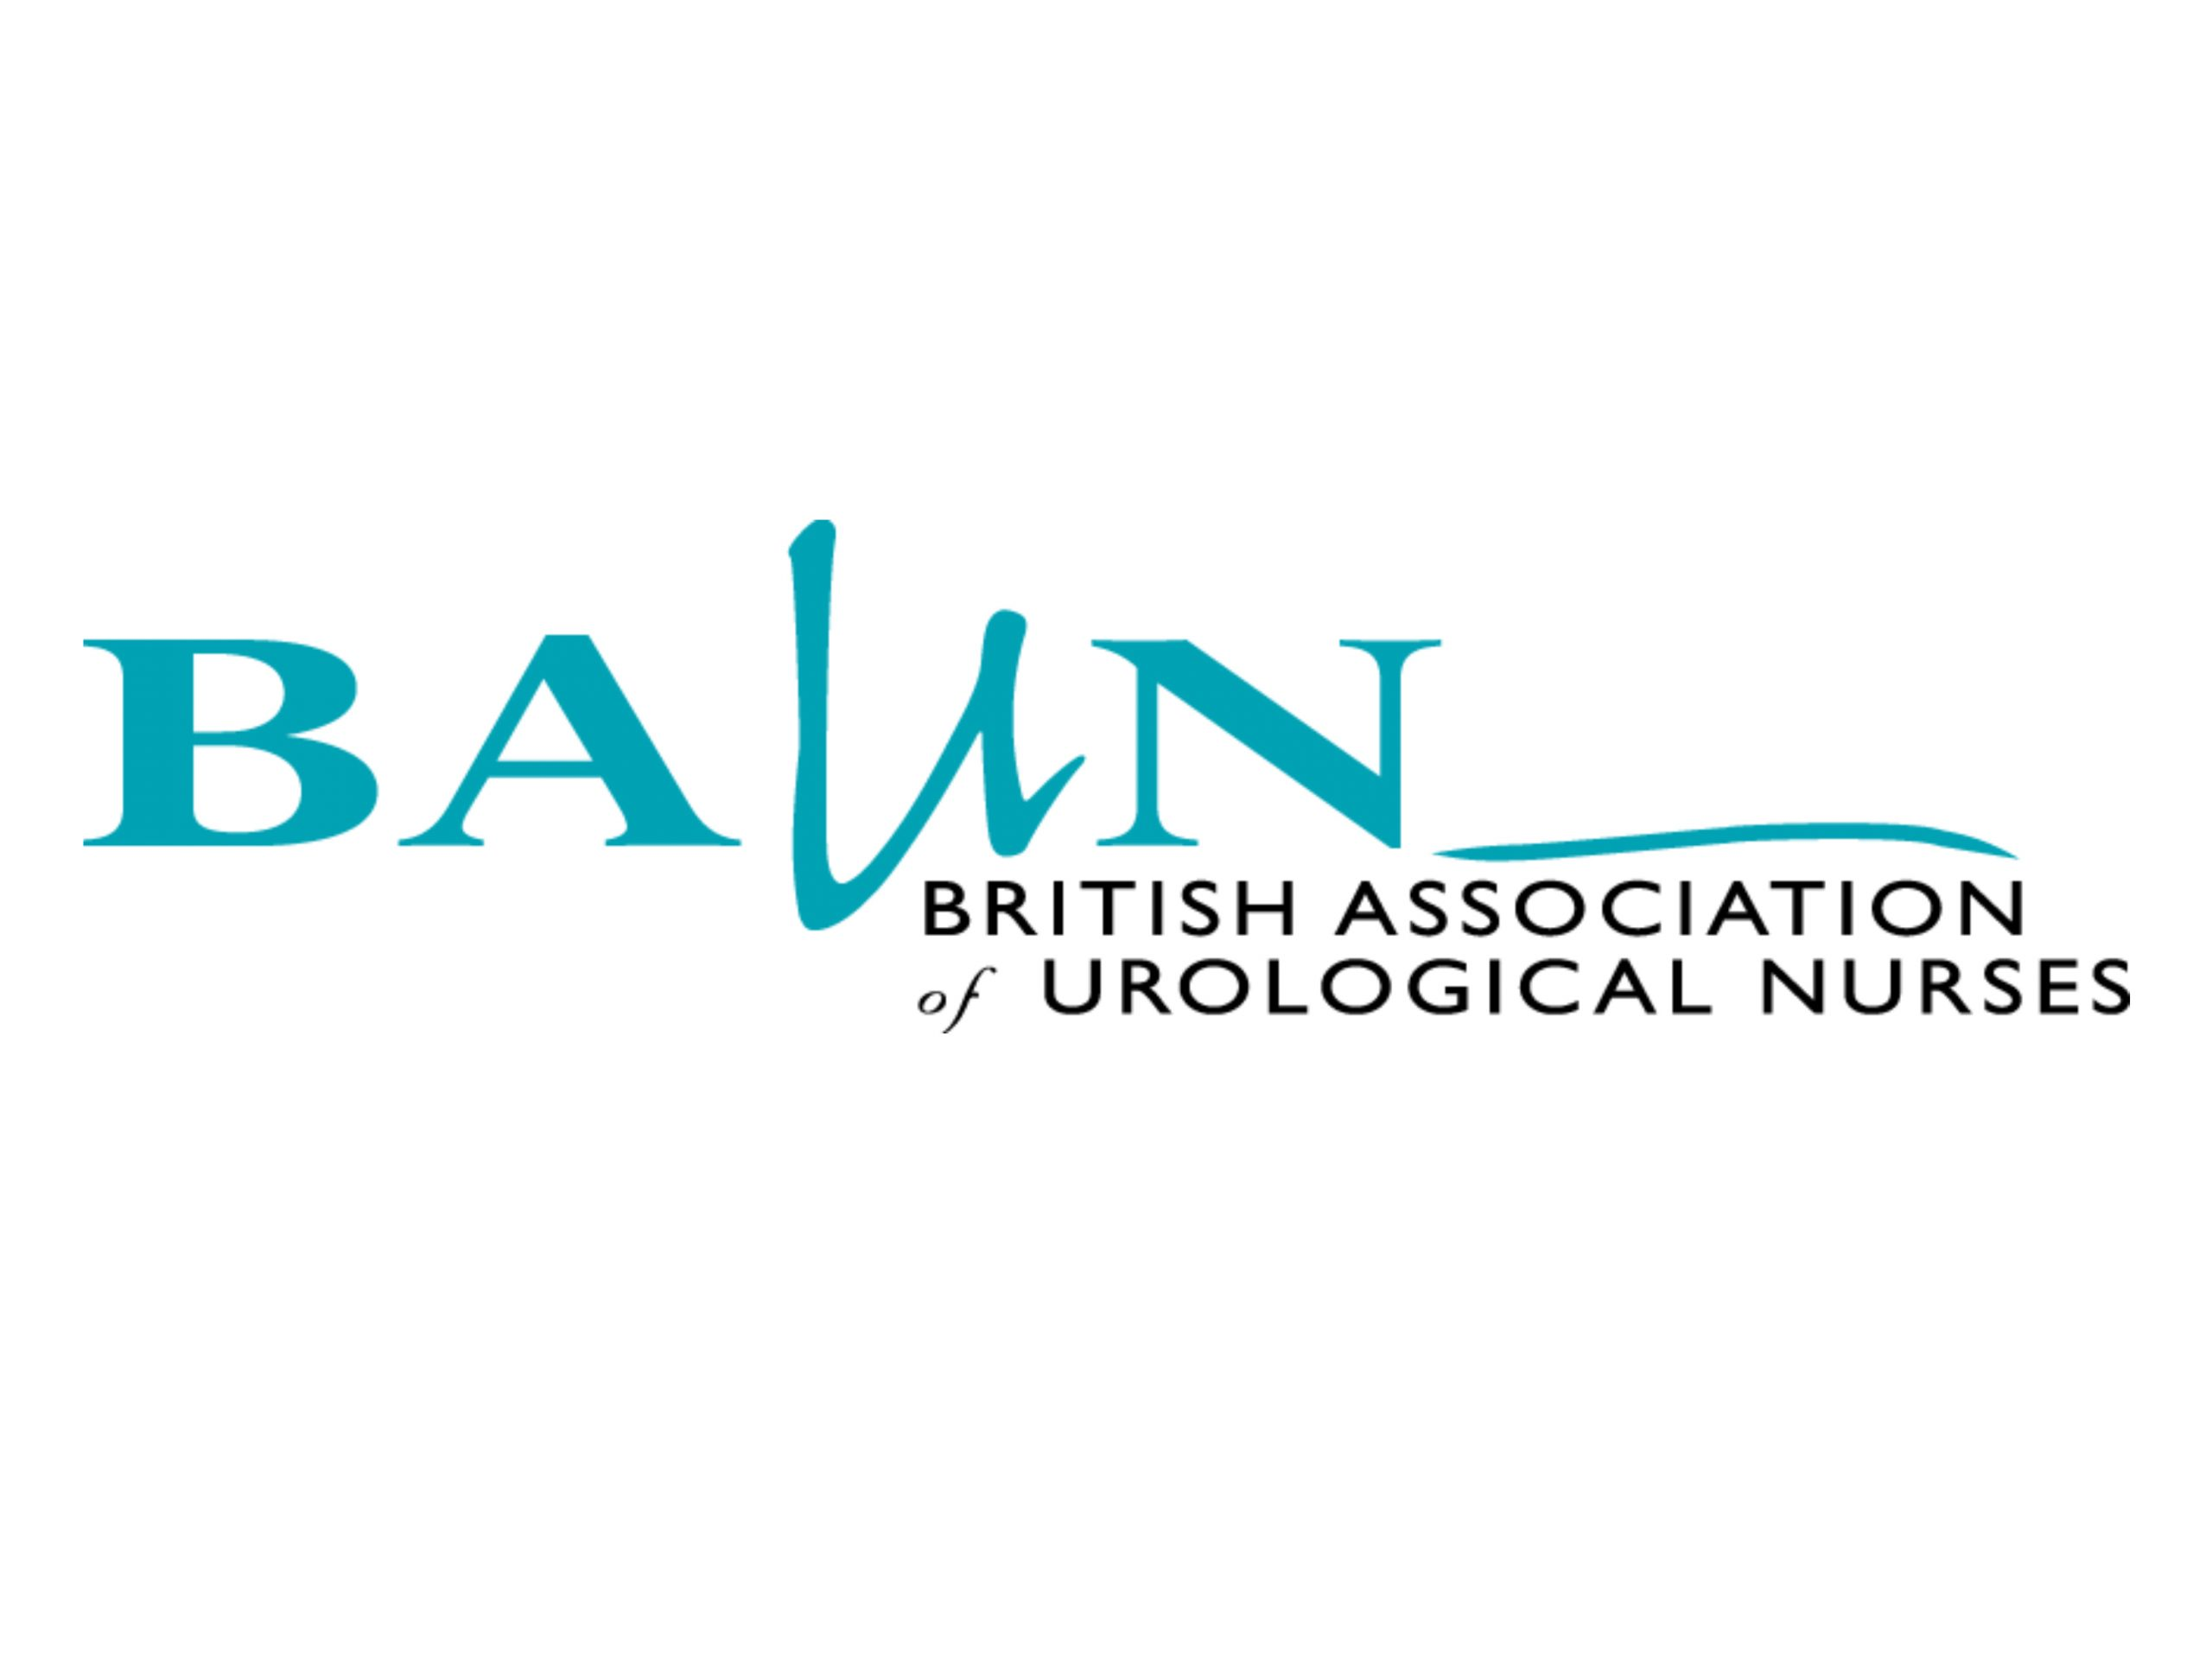 British Association of Urology Nurses